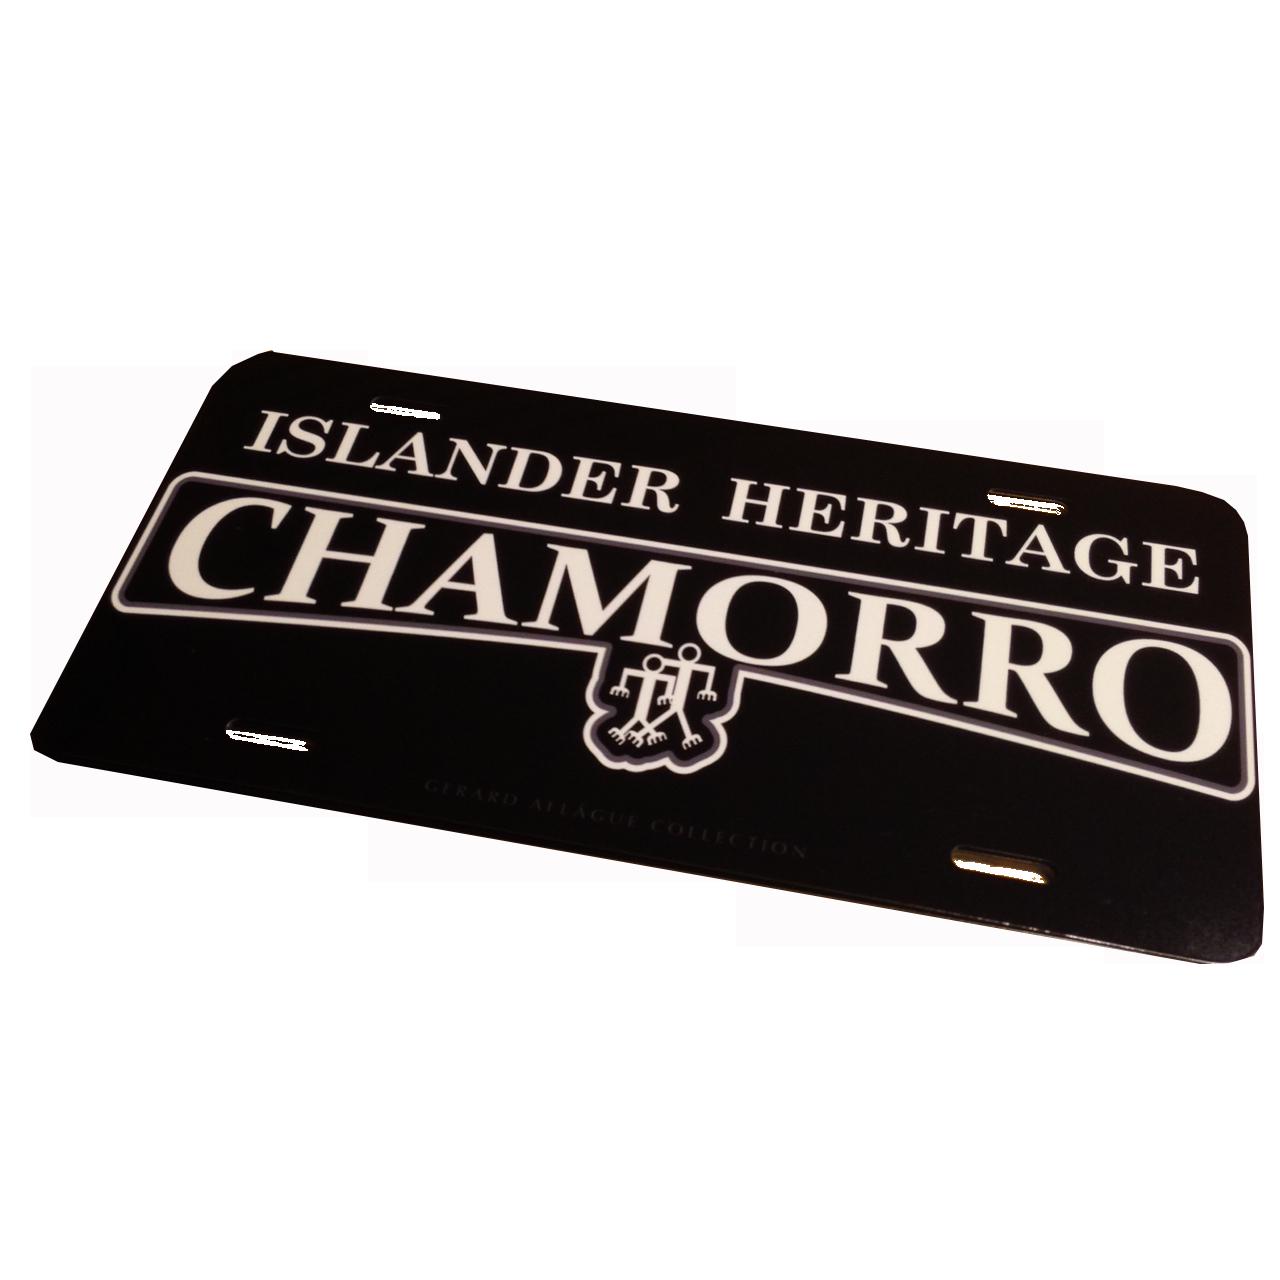 Chamorro Islander Heritage License Plate 6 X 12